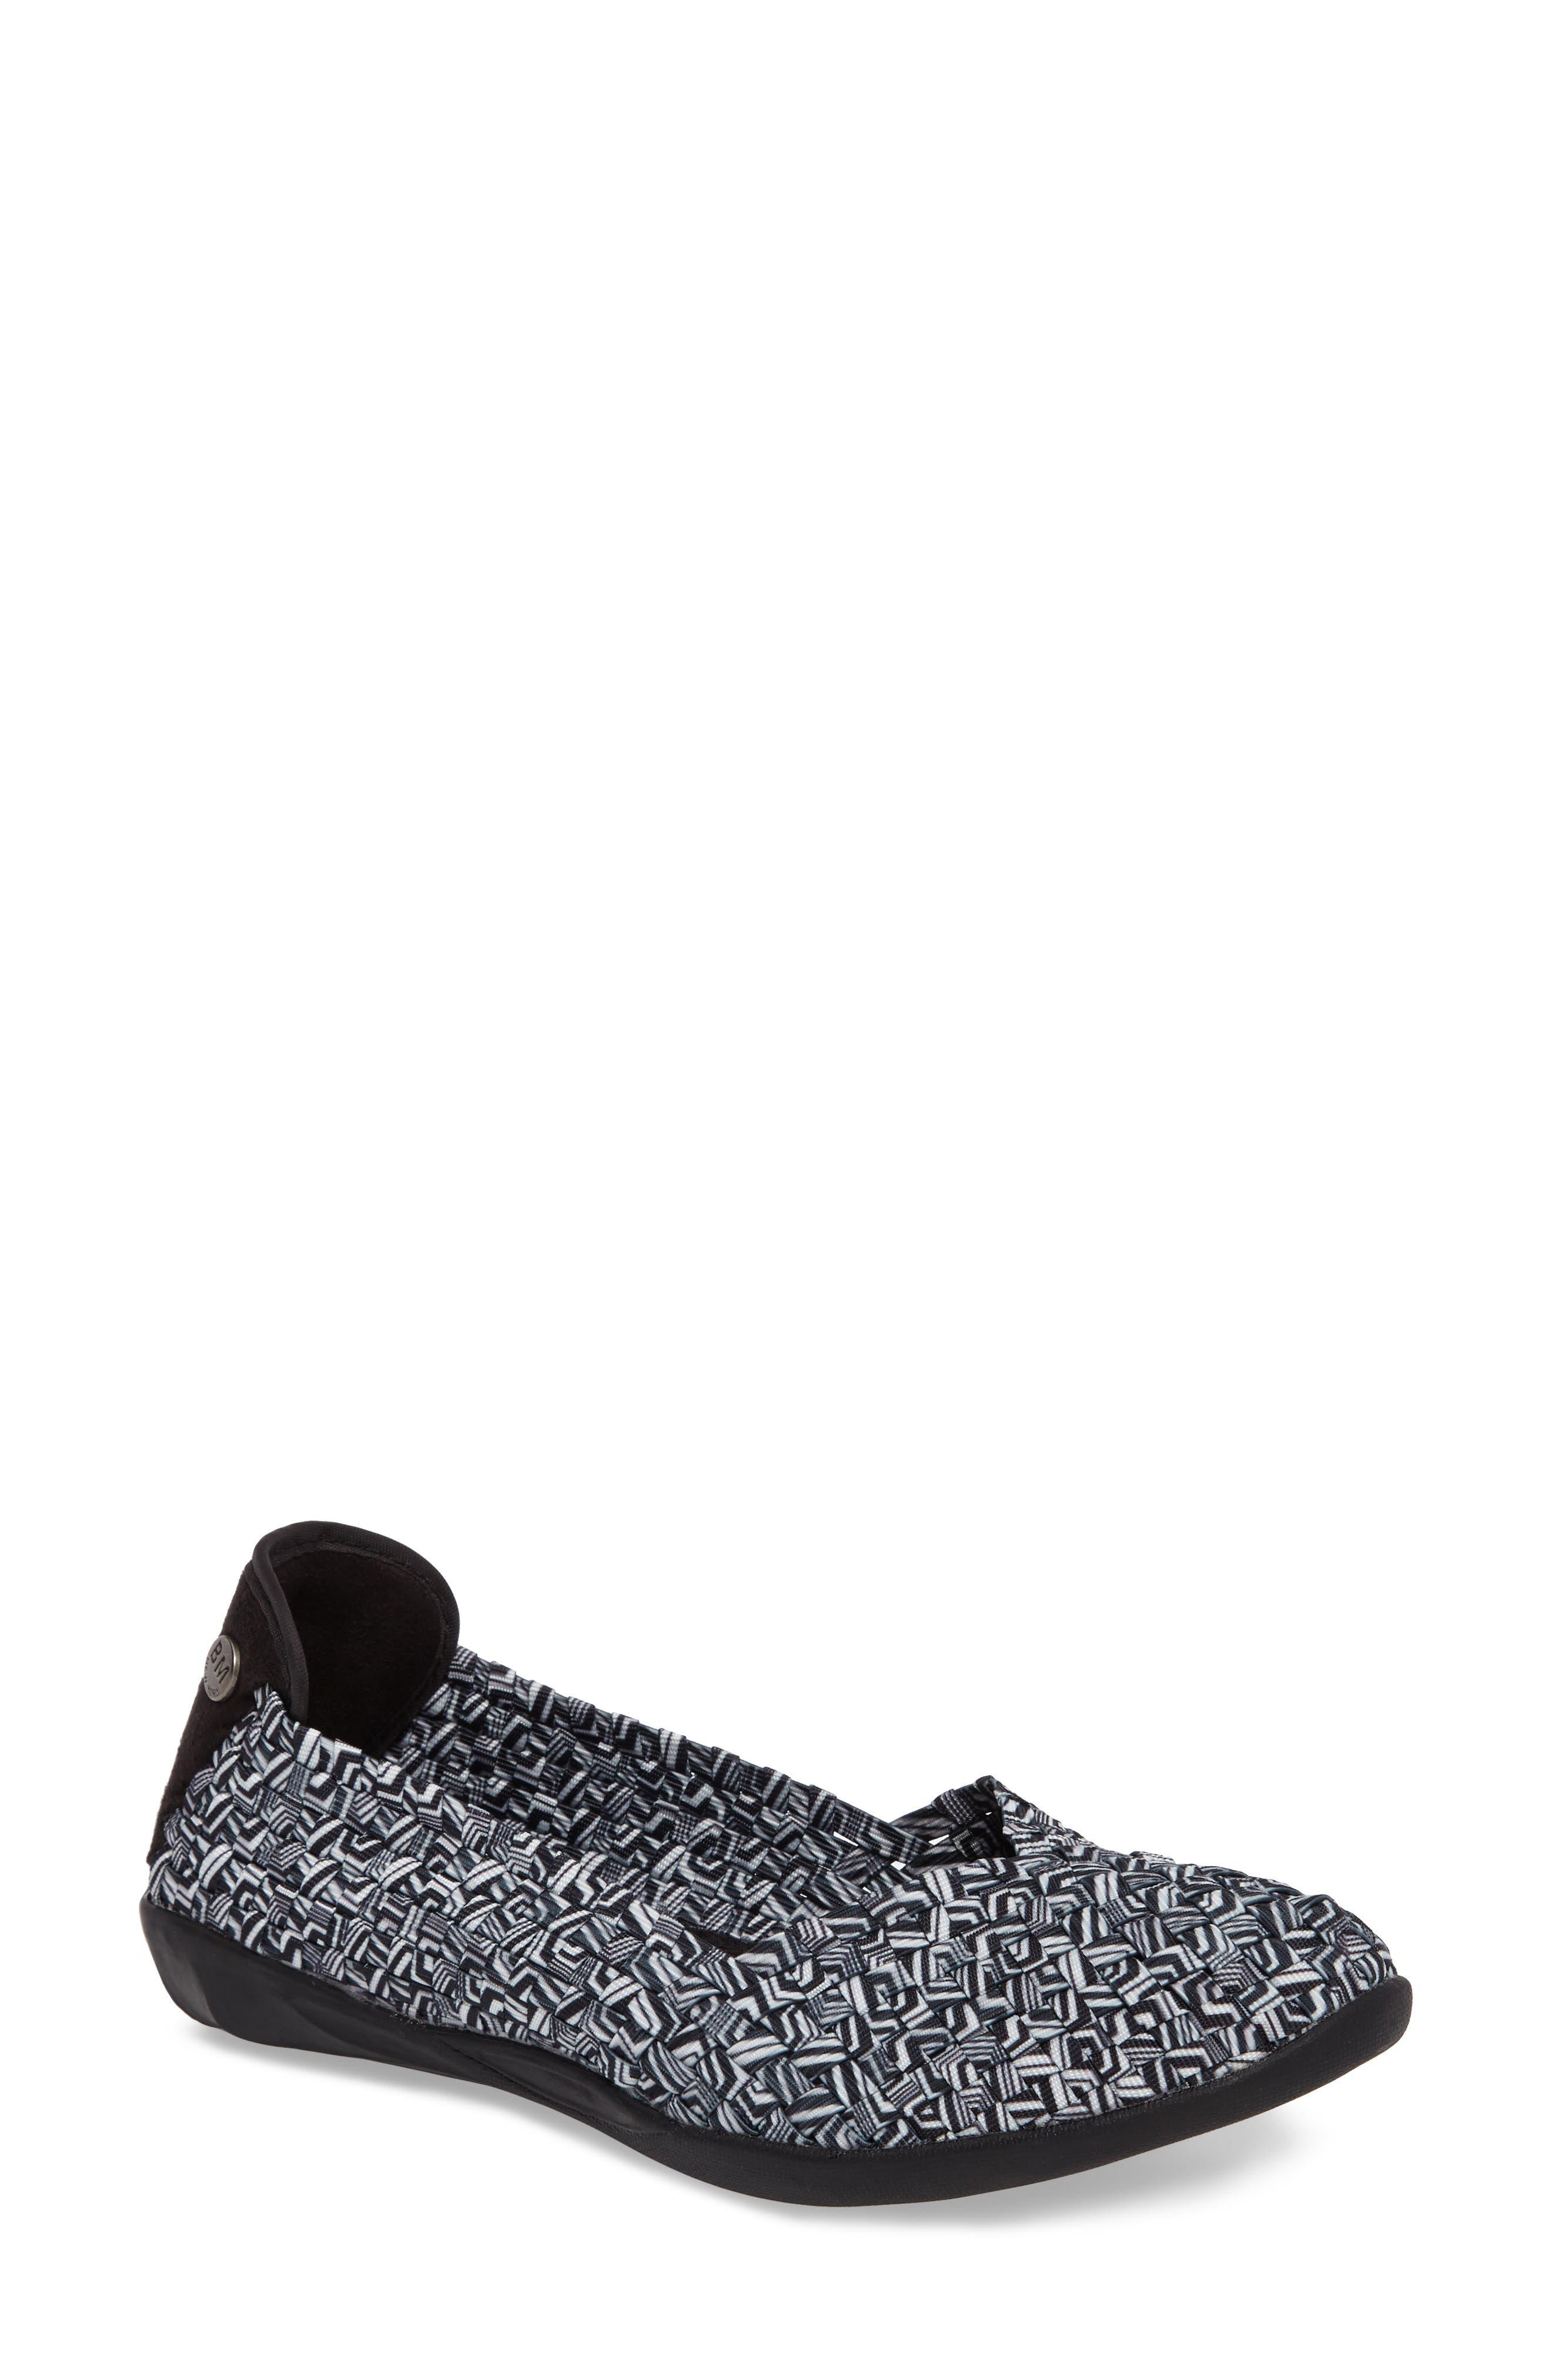 Alternate Image 1 Selected - bernie mev. Catwalk Sneaker (Women)